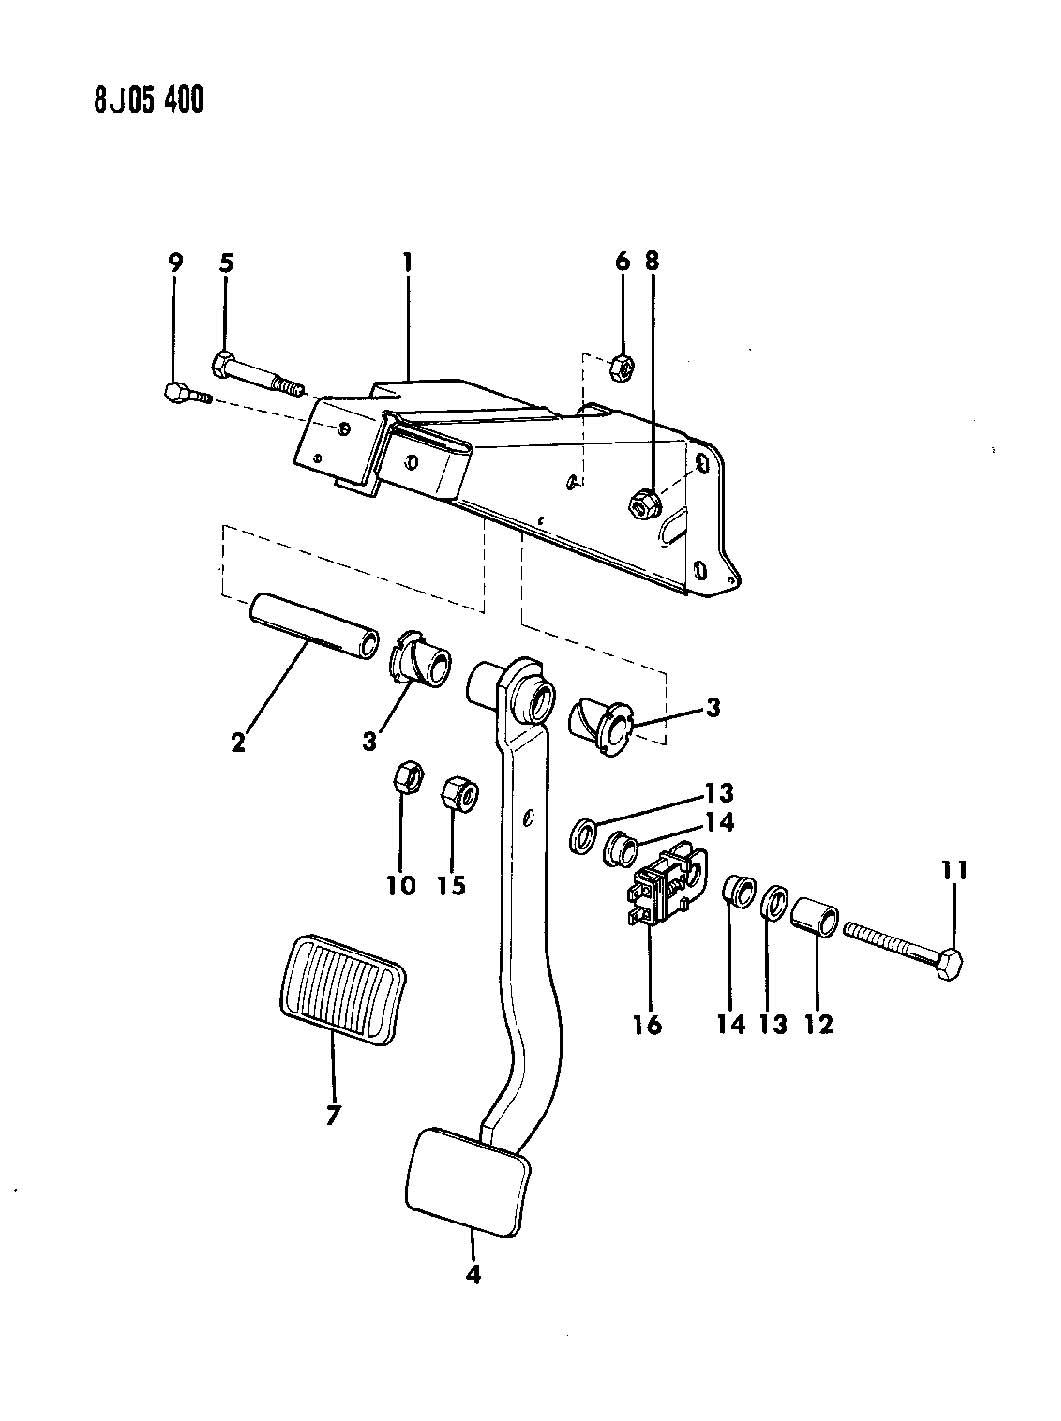 1989 Jeep Cherokee PEDAL, BRAKE CHEROKEE, WAGONEER, COMANCHE